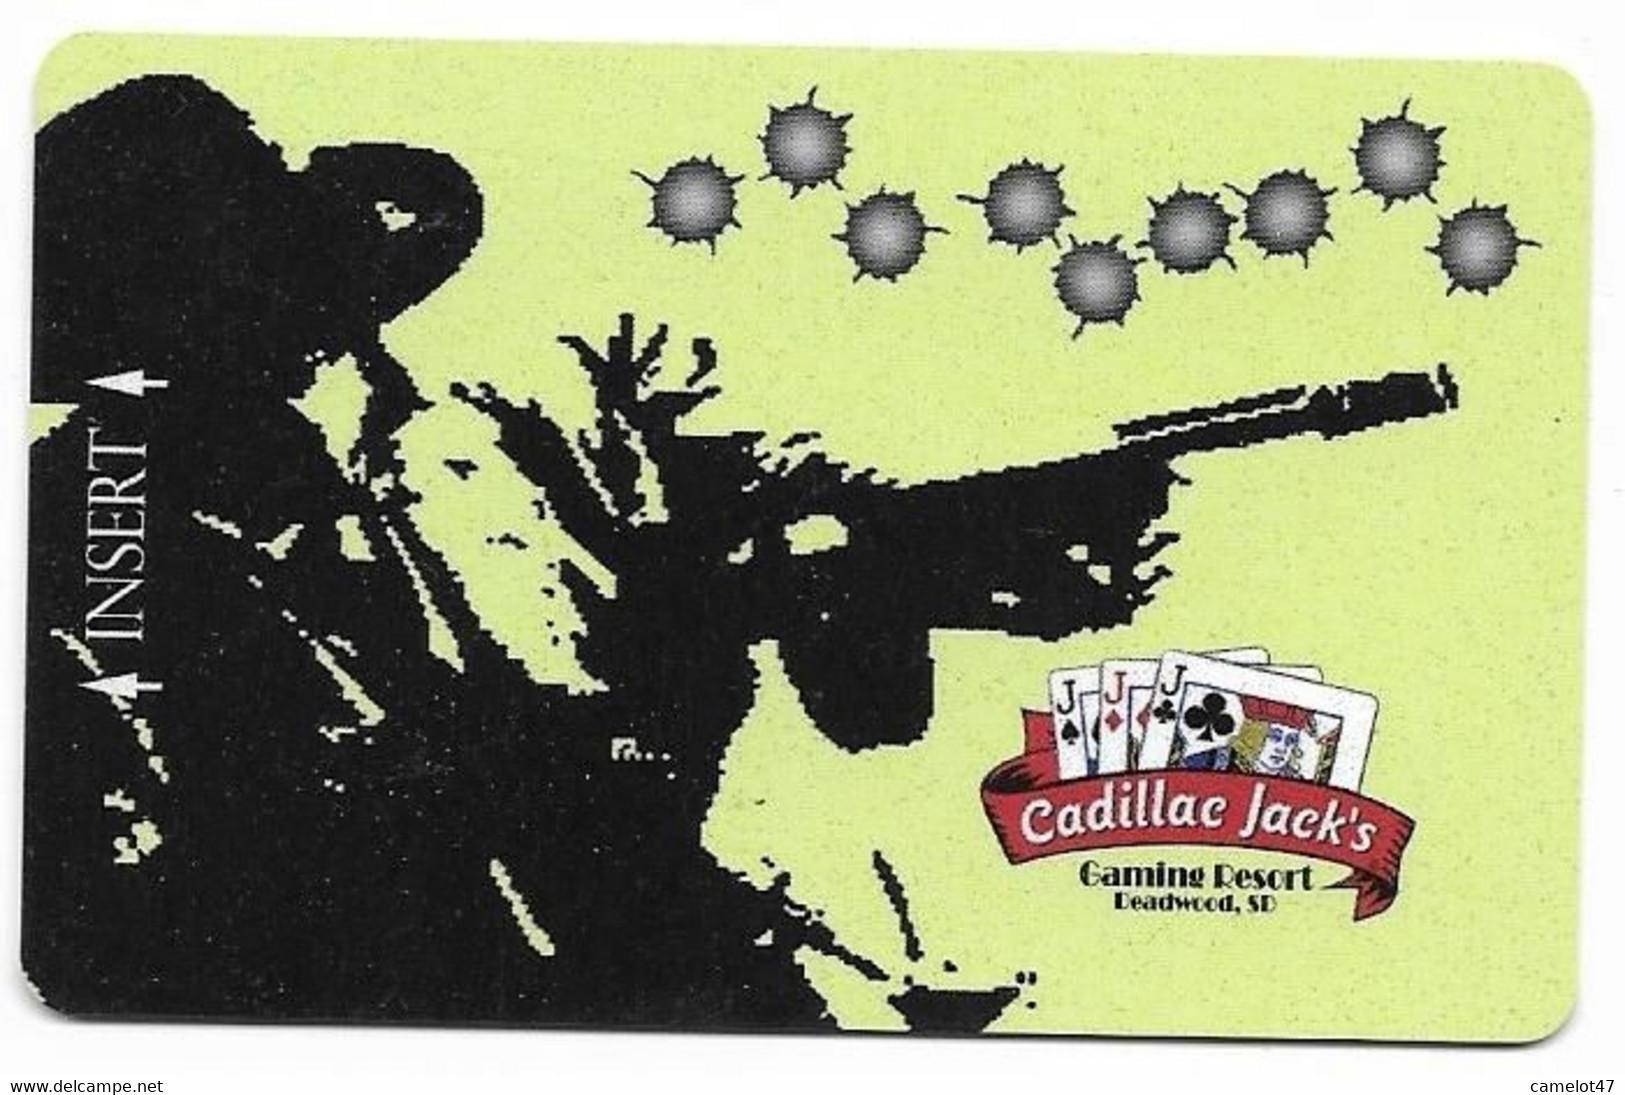 Cadillac Jack's Casino, Deadwood, SD, U.S.A. Older Used  BLANK Slot Or Player's Card, # Cadillacjacks-3blank - Casino Cards